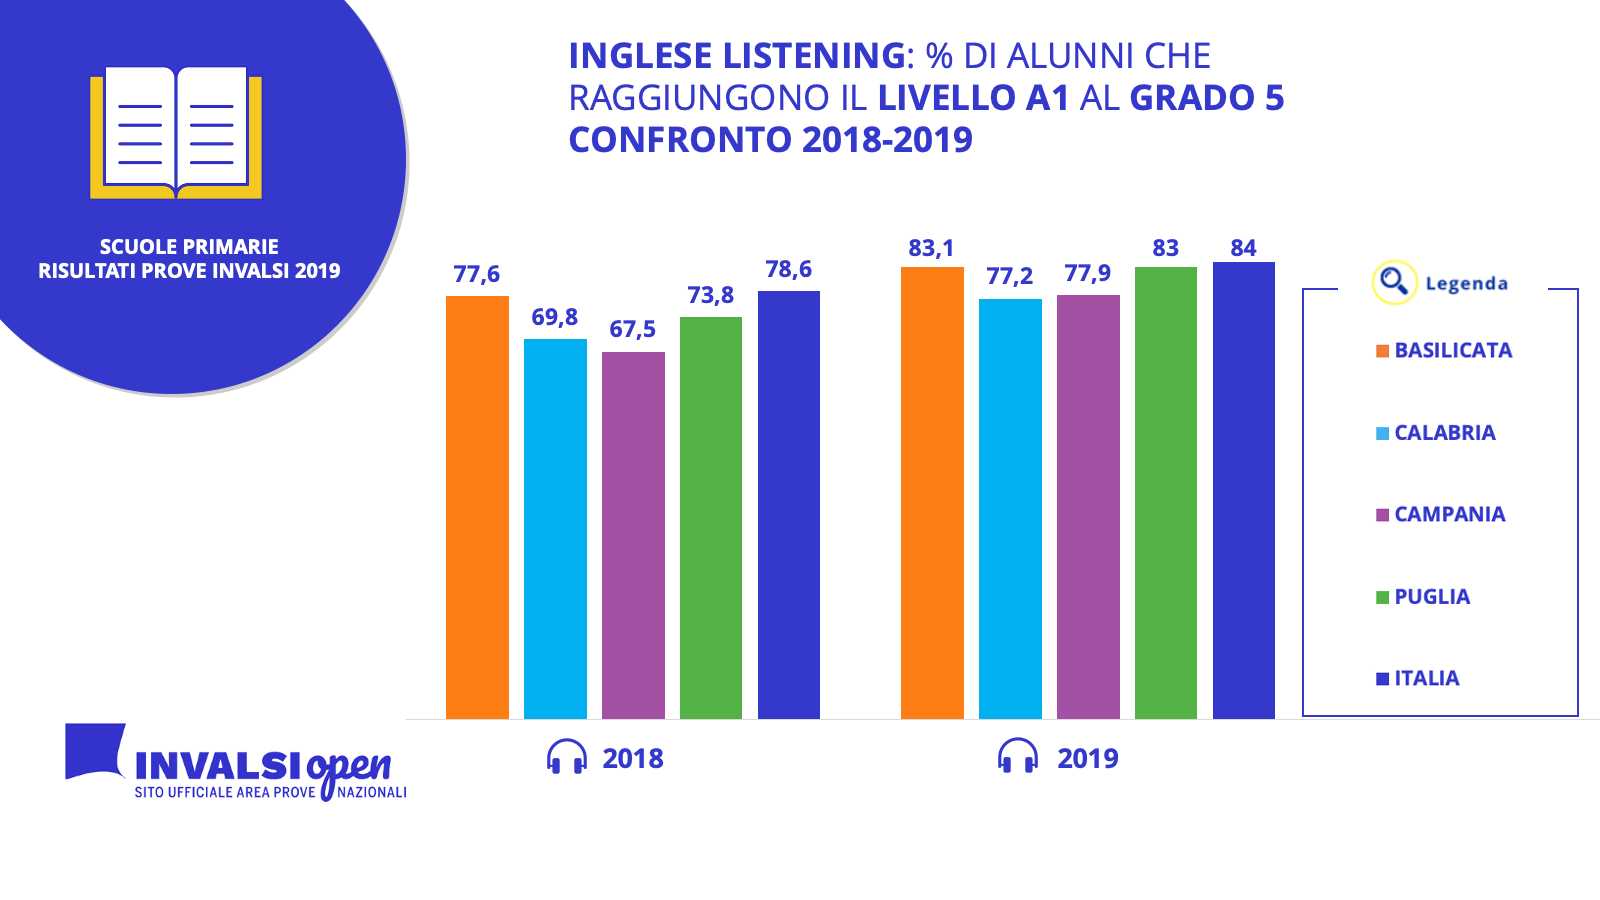 PRIMARIE ING LISTENING TREND 2018-2019